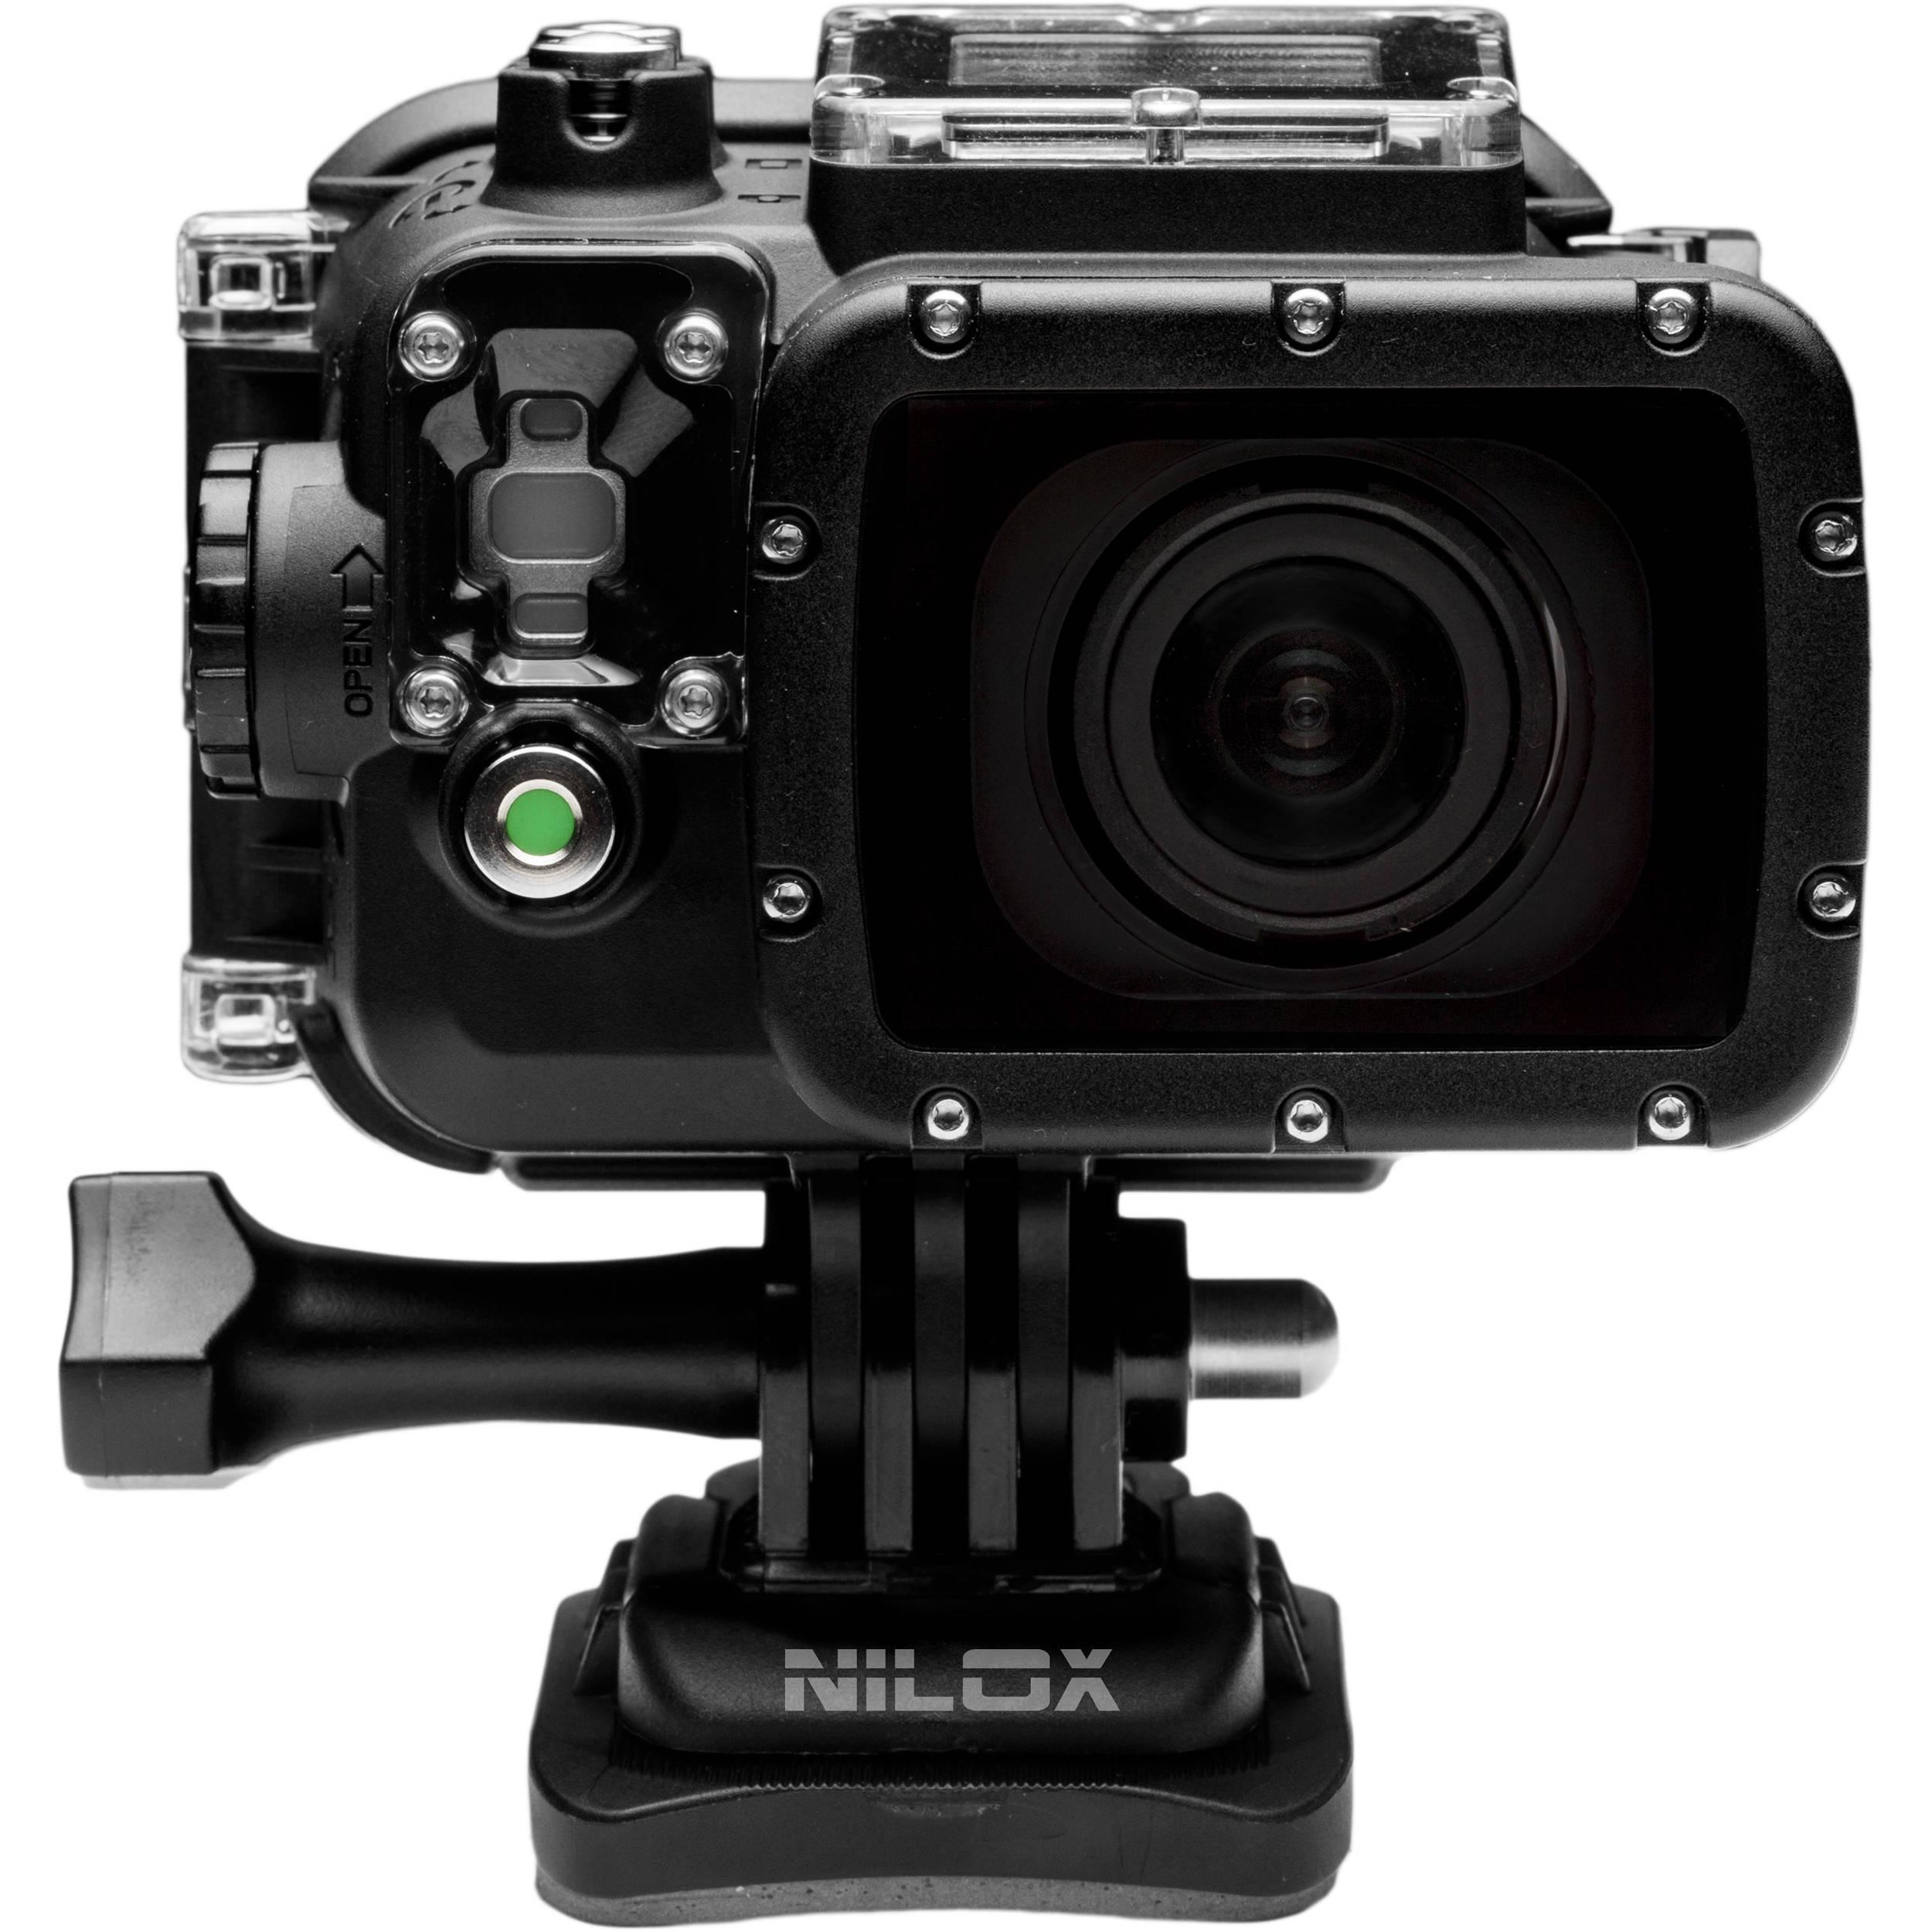 Camaras Video Nilox Mini F Action Cam | PcExpansion.es